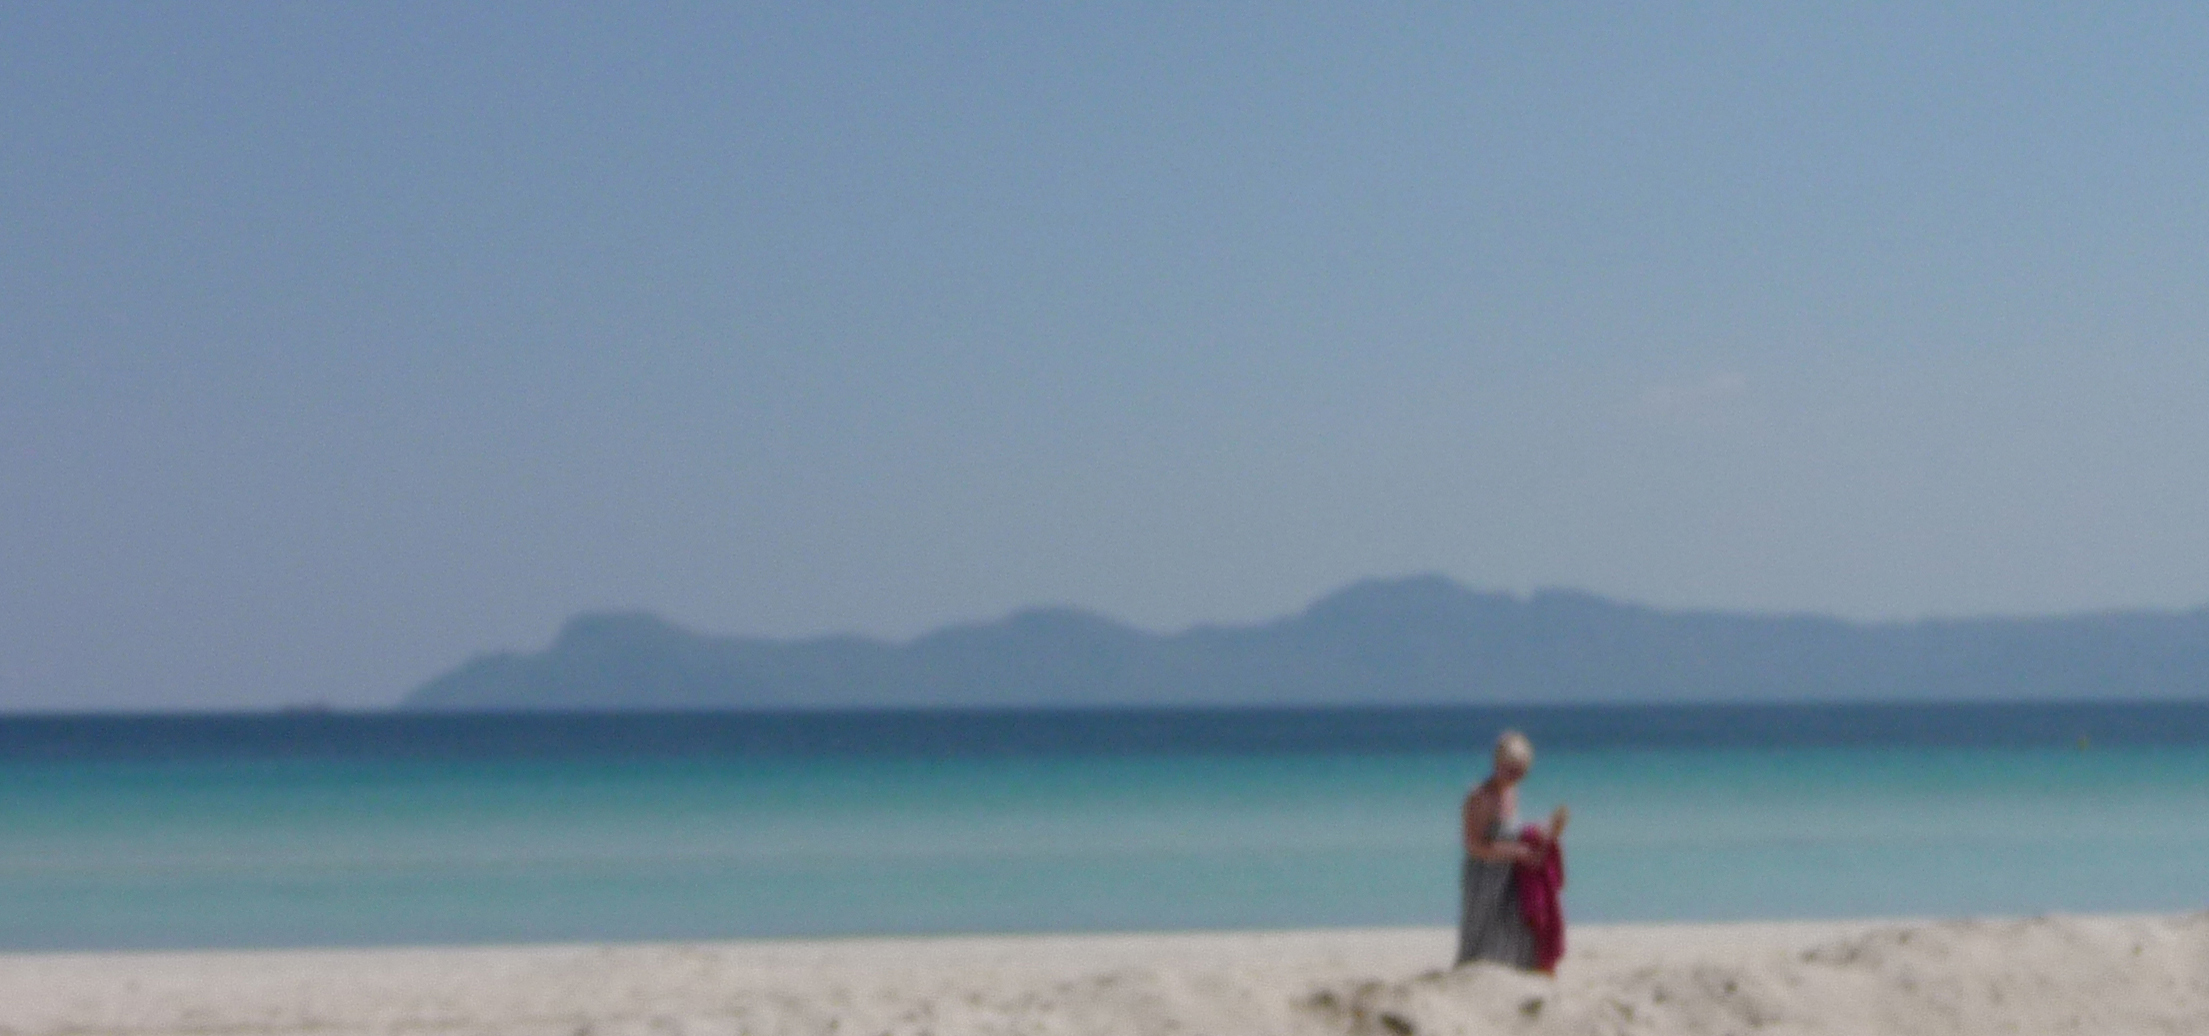 Die Frau am Strand